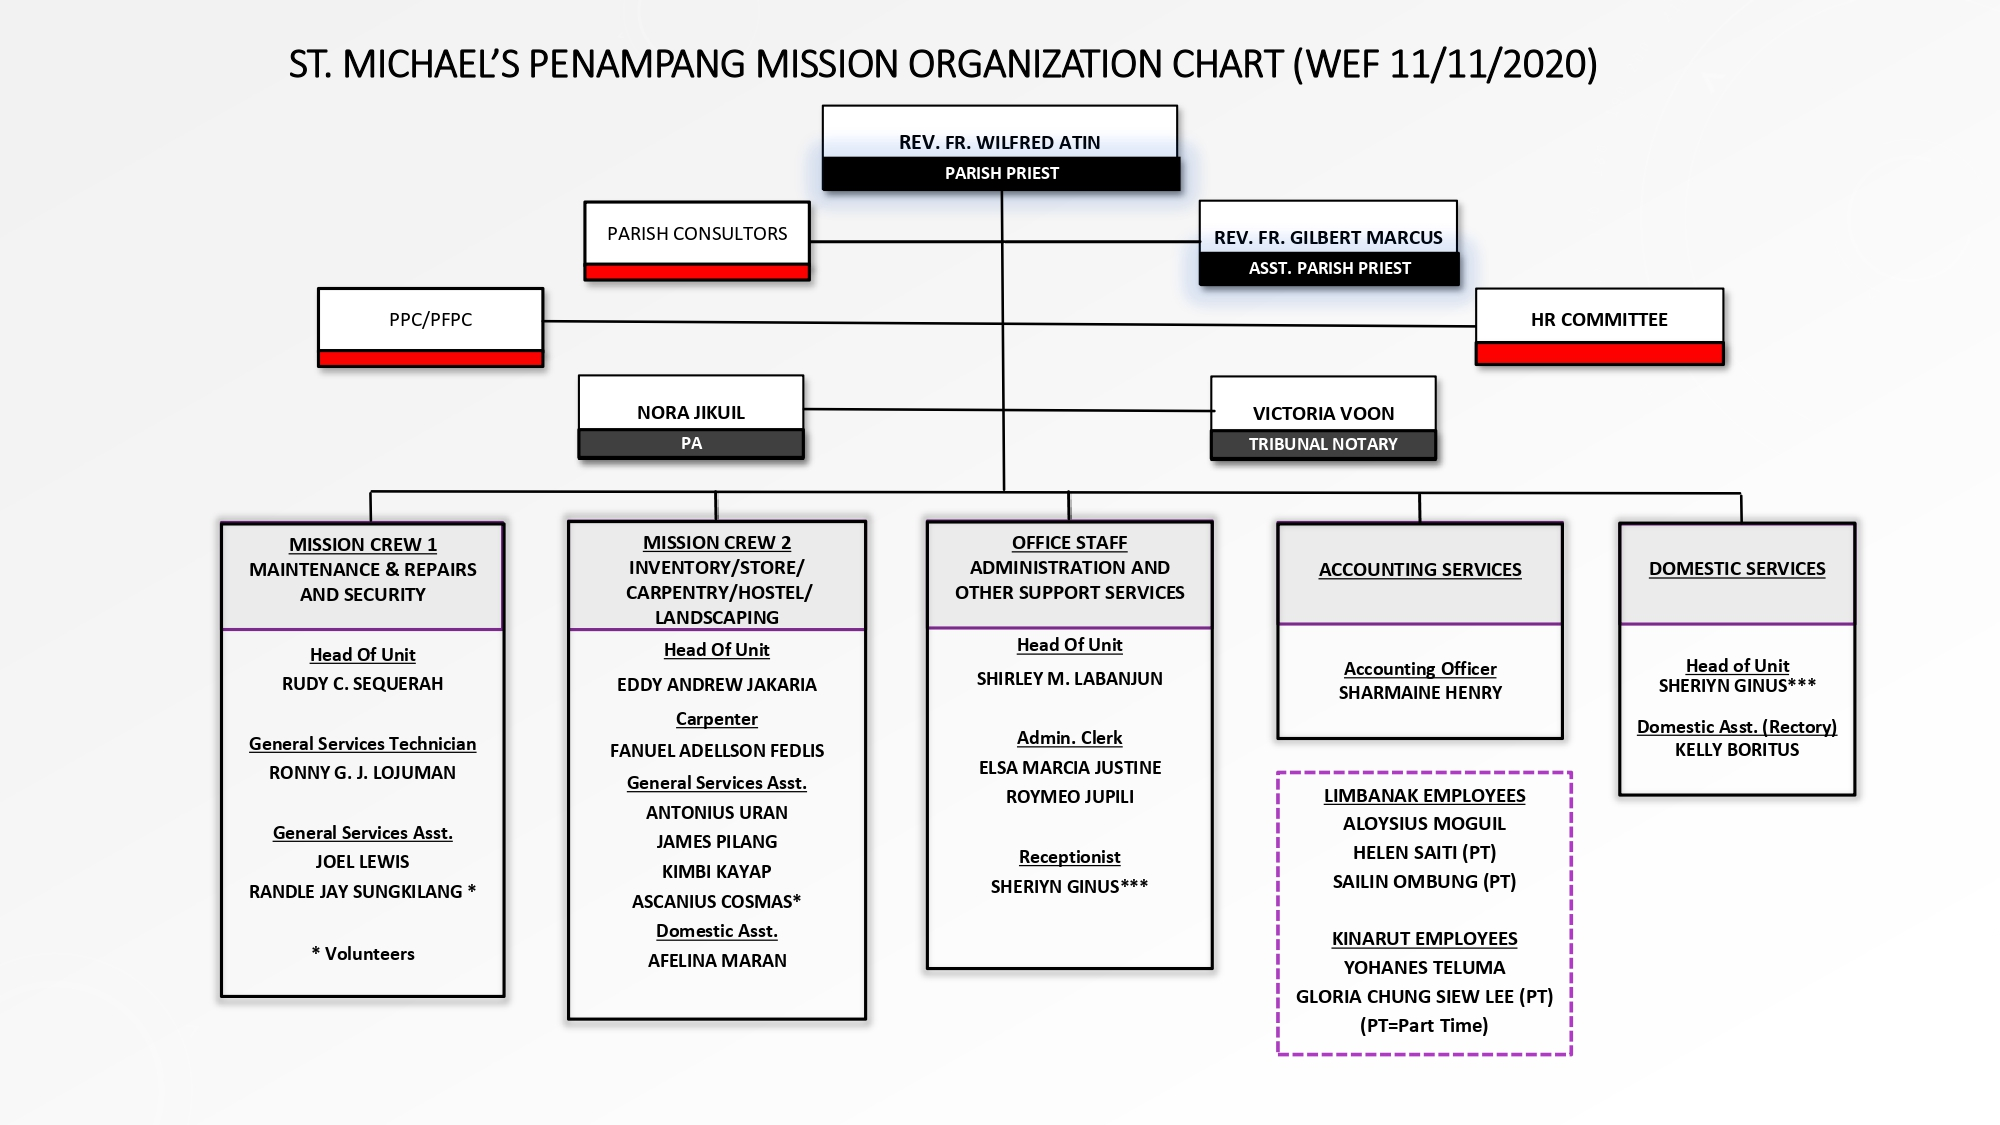 Organization CHART - WEF1 JAN 2021 UPDATED NOV2020 V4 (1)_page-0001